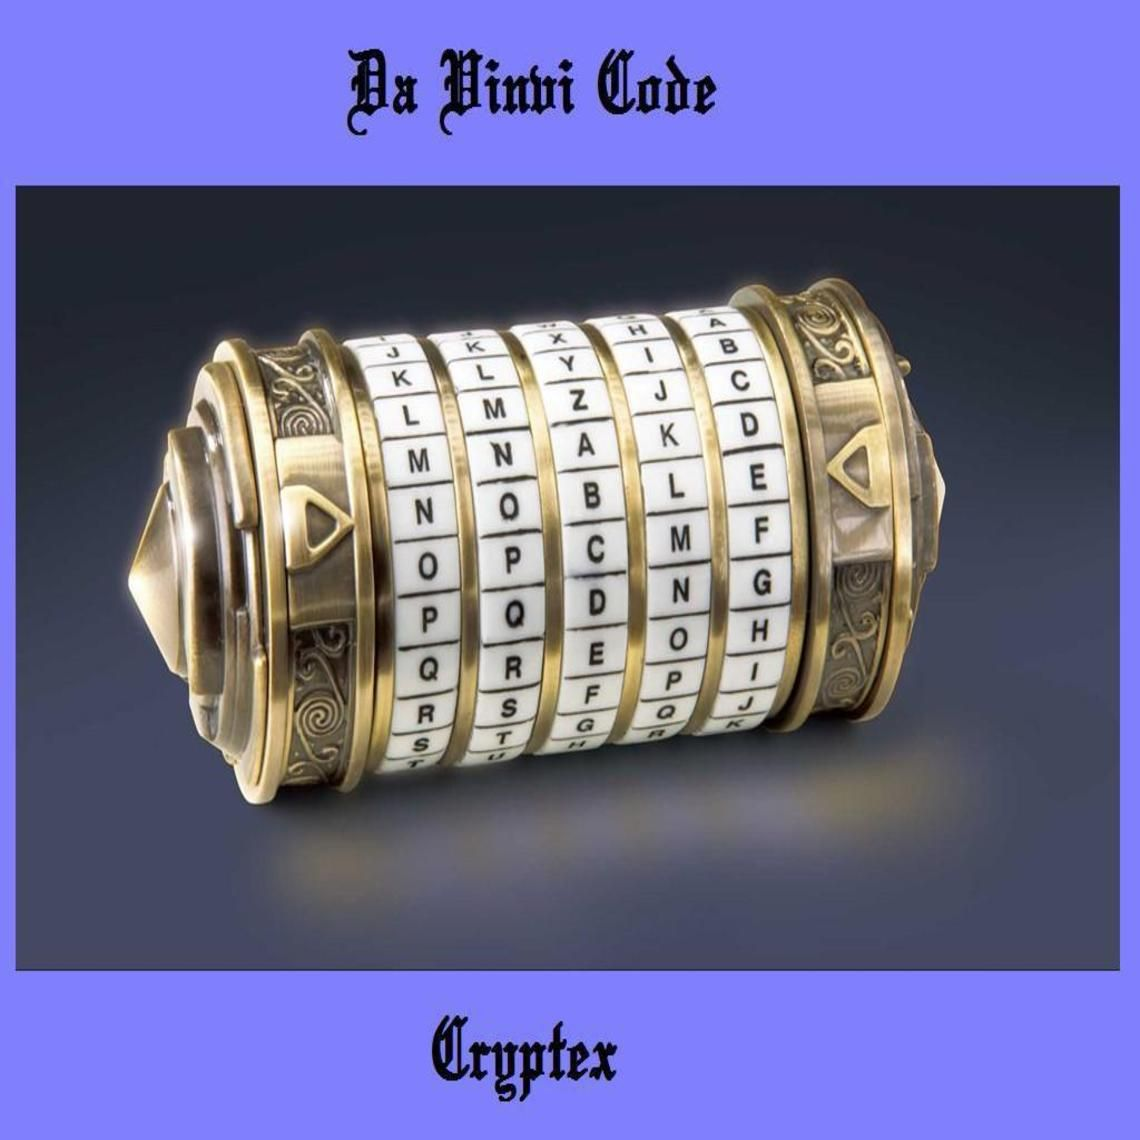 Da Vinci Code Cryptex Coding